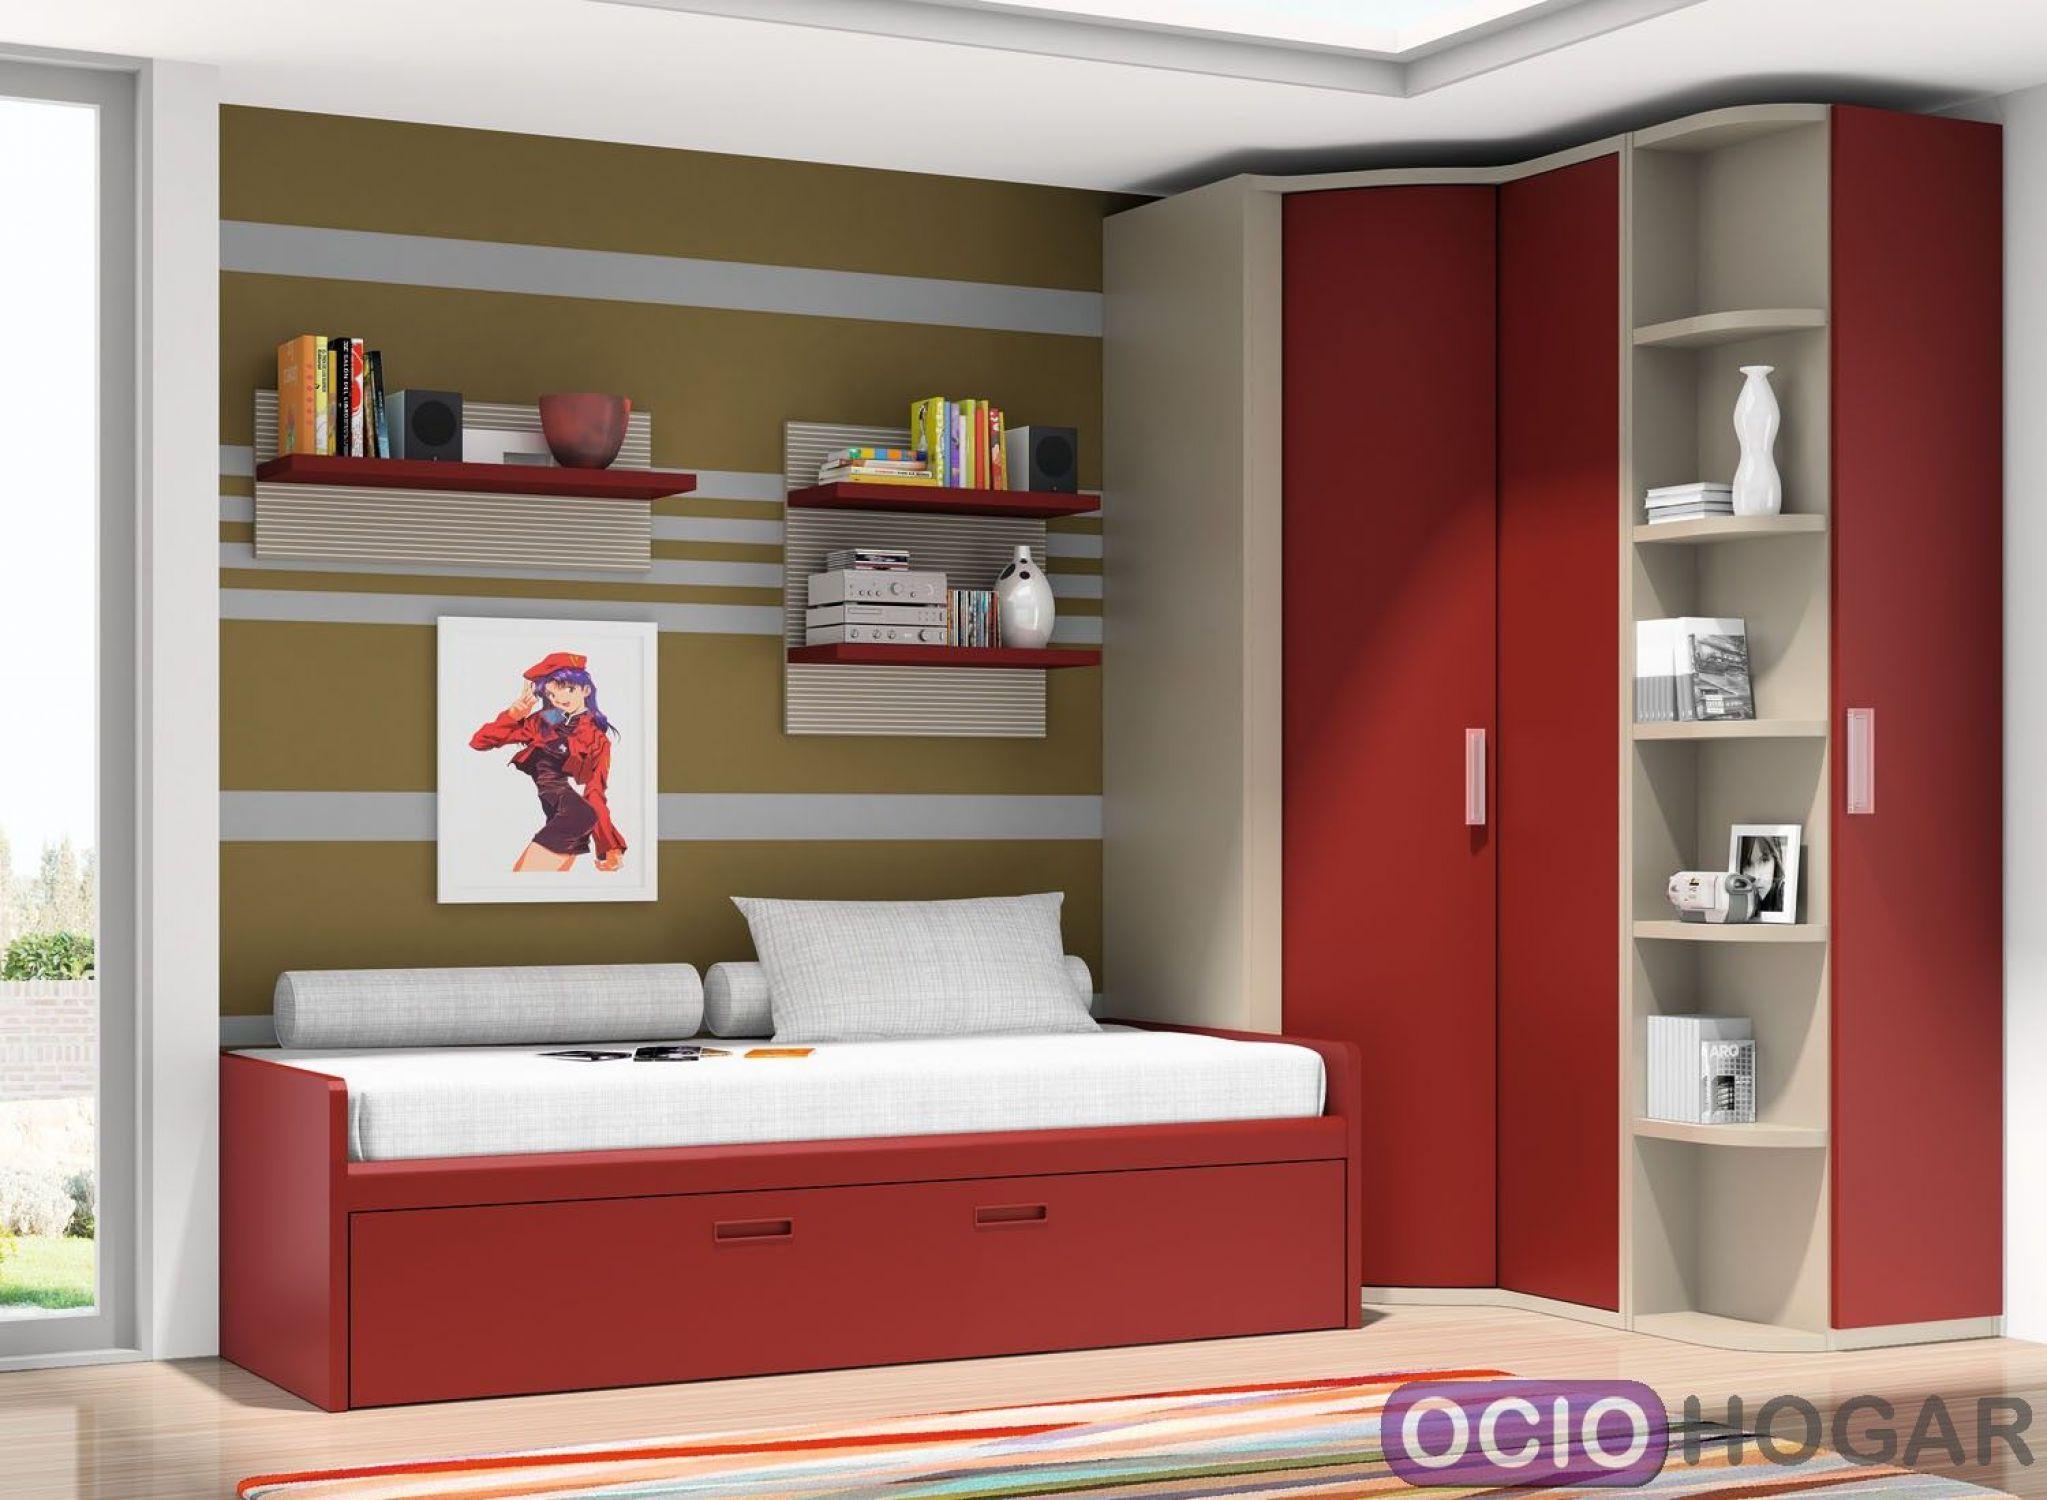 Dormitorio Juvenil Cabernet Dissery Muebles Juveniles